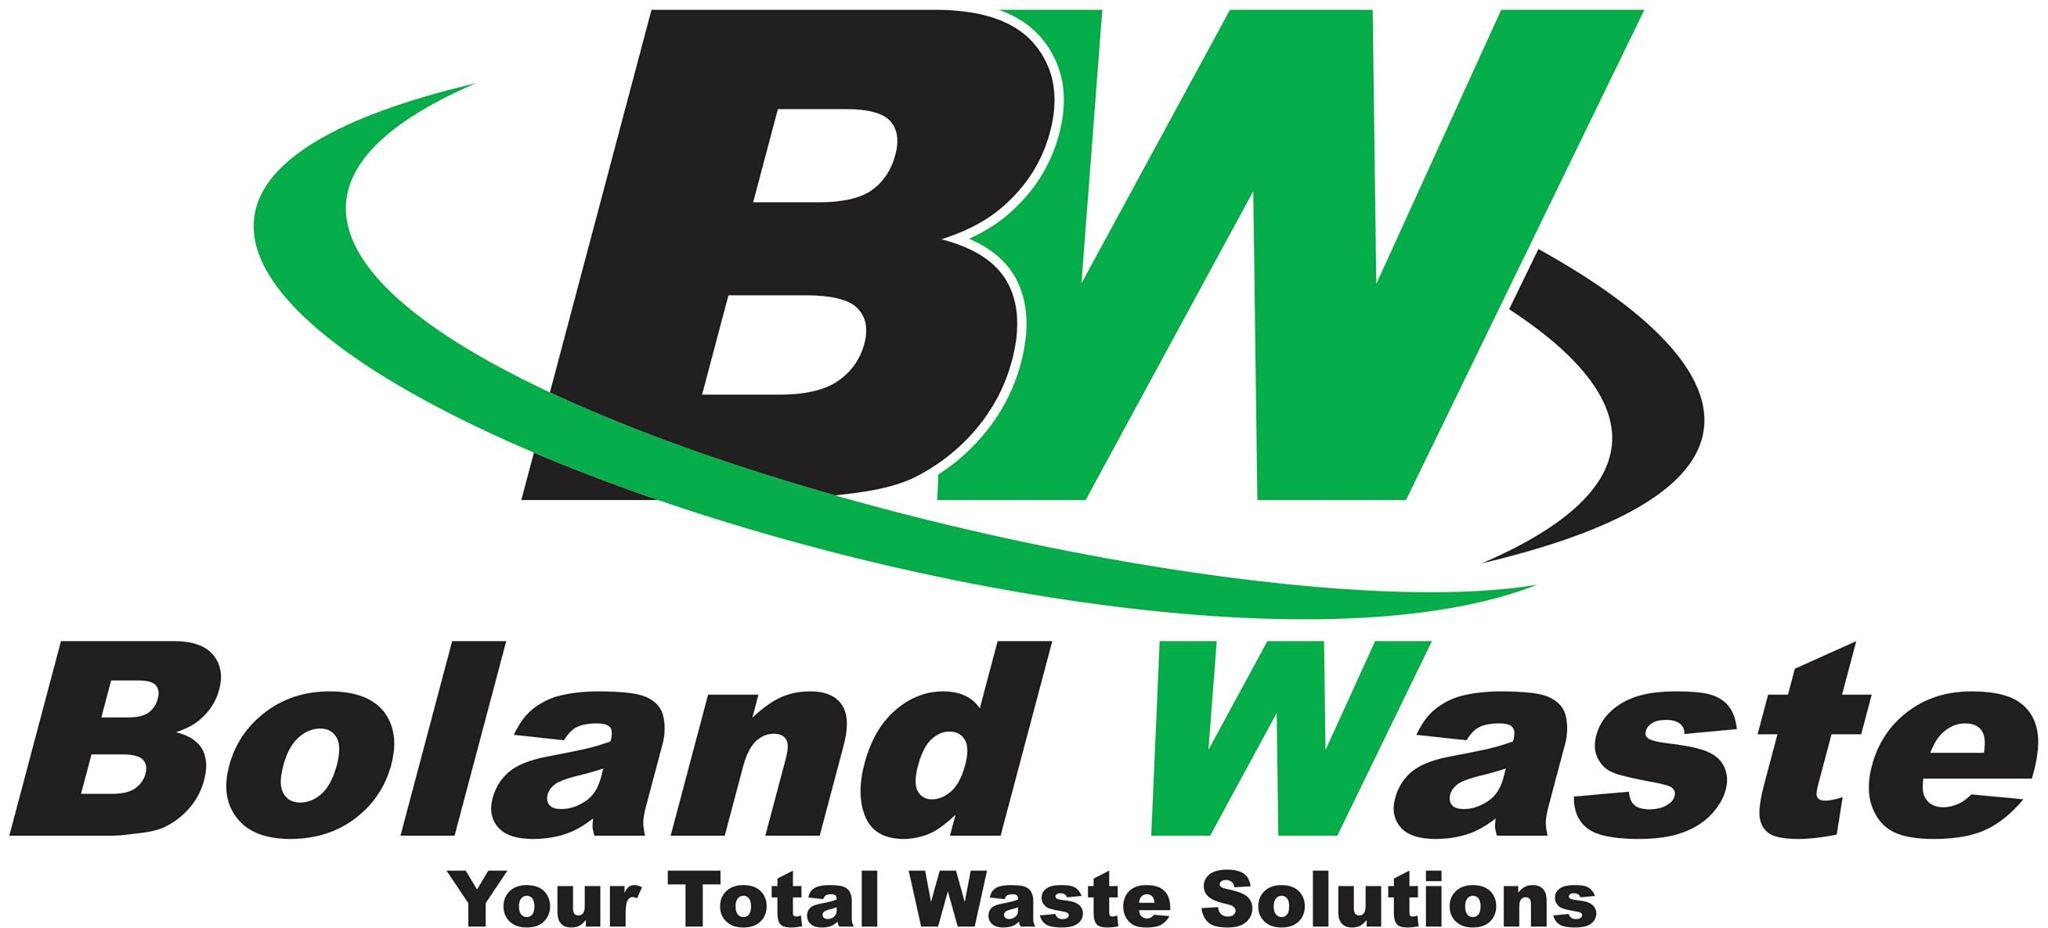 Boland Waste Logo revamp Design